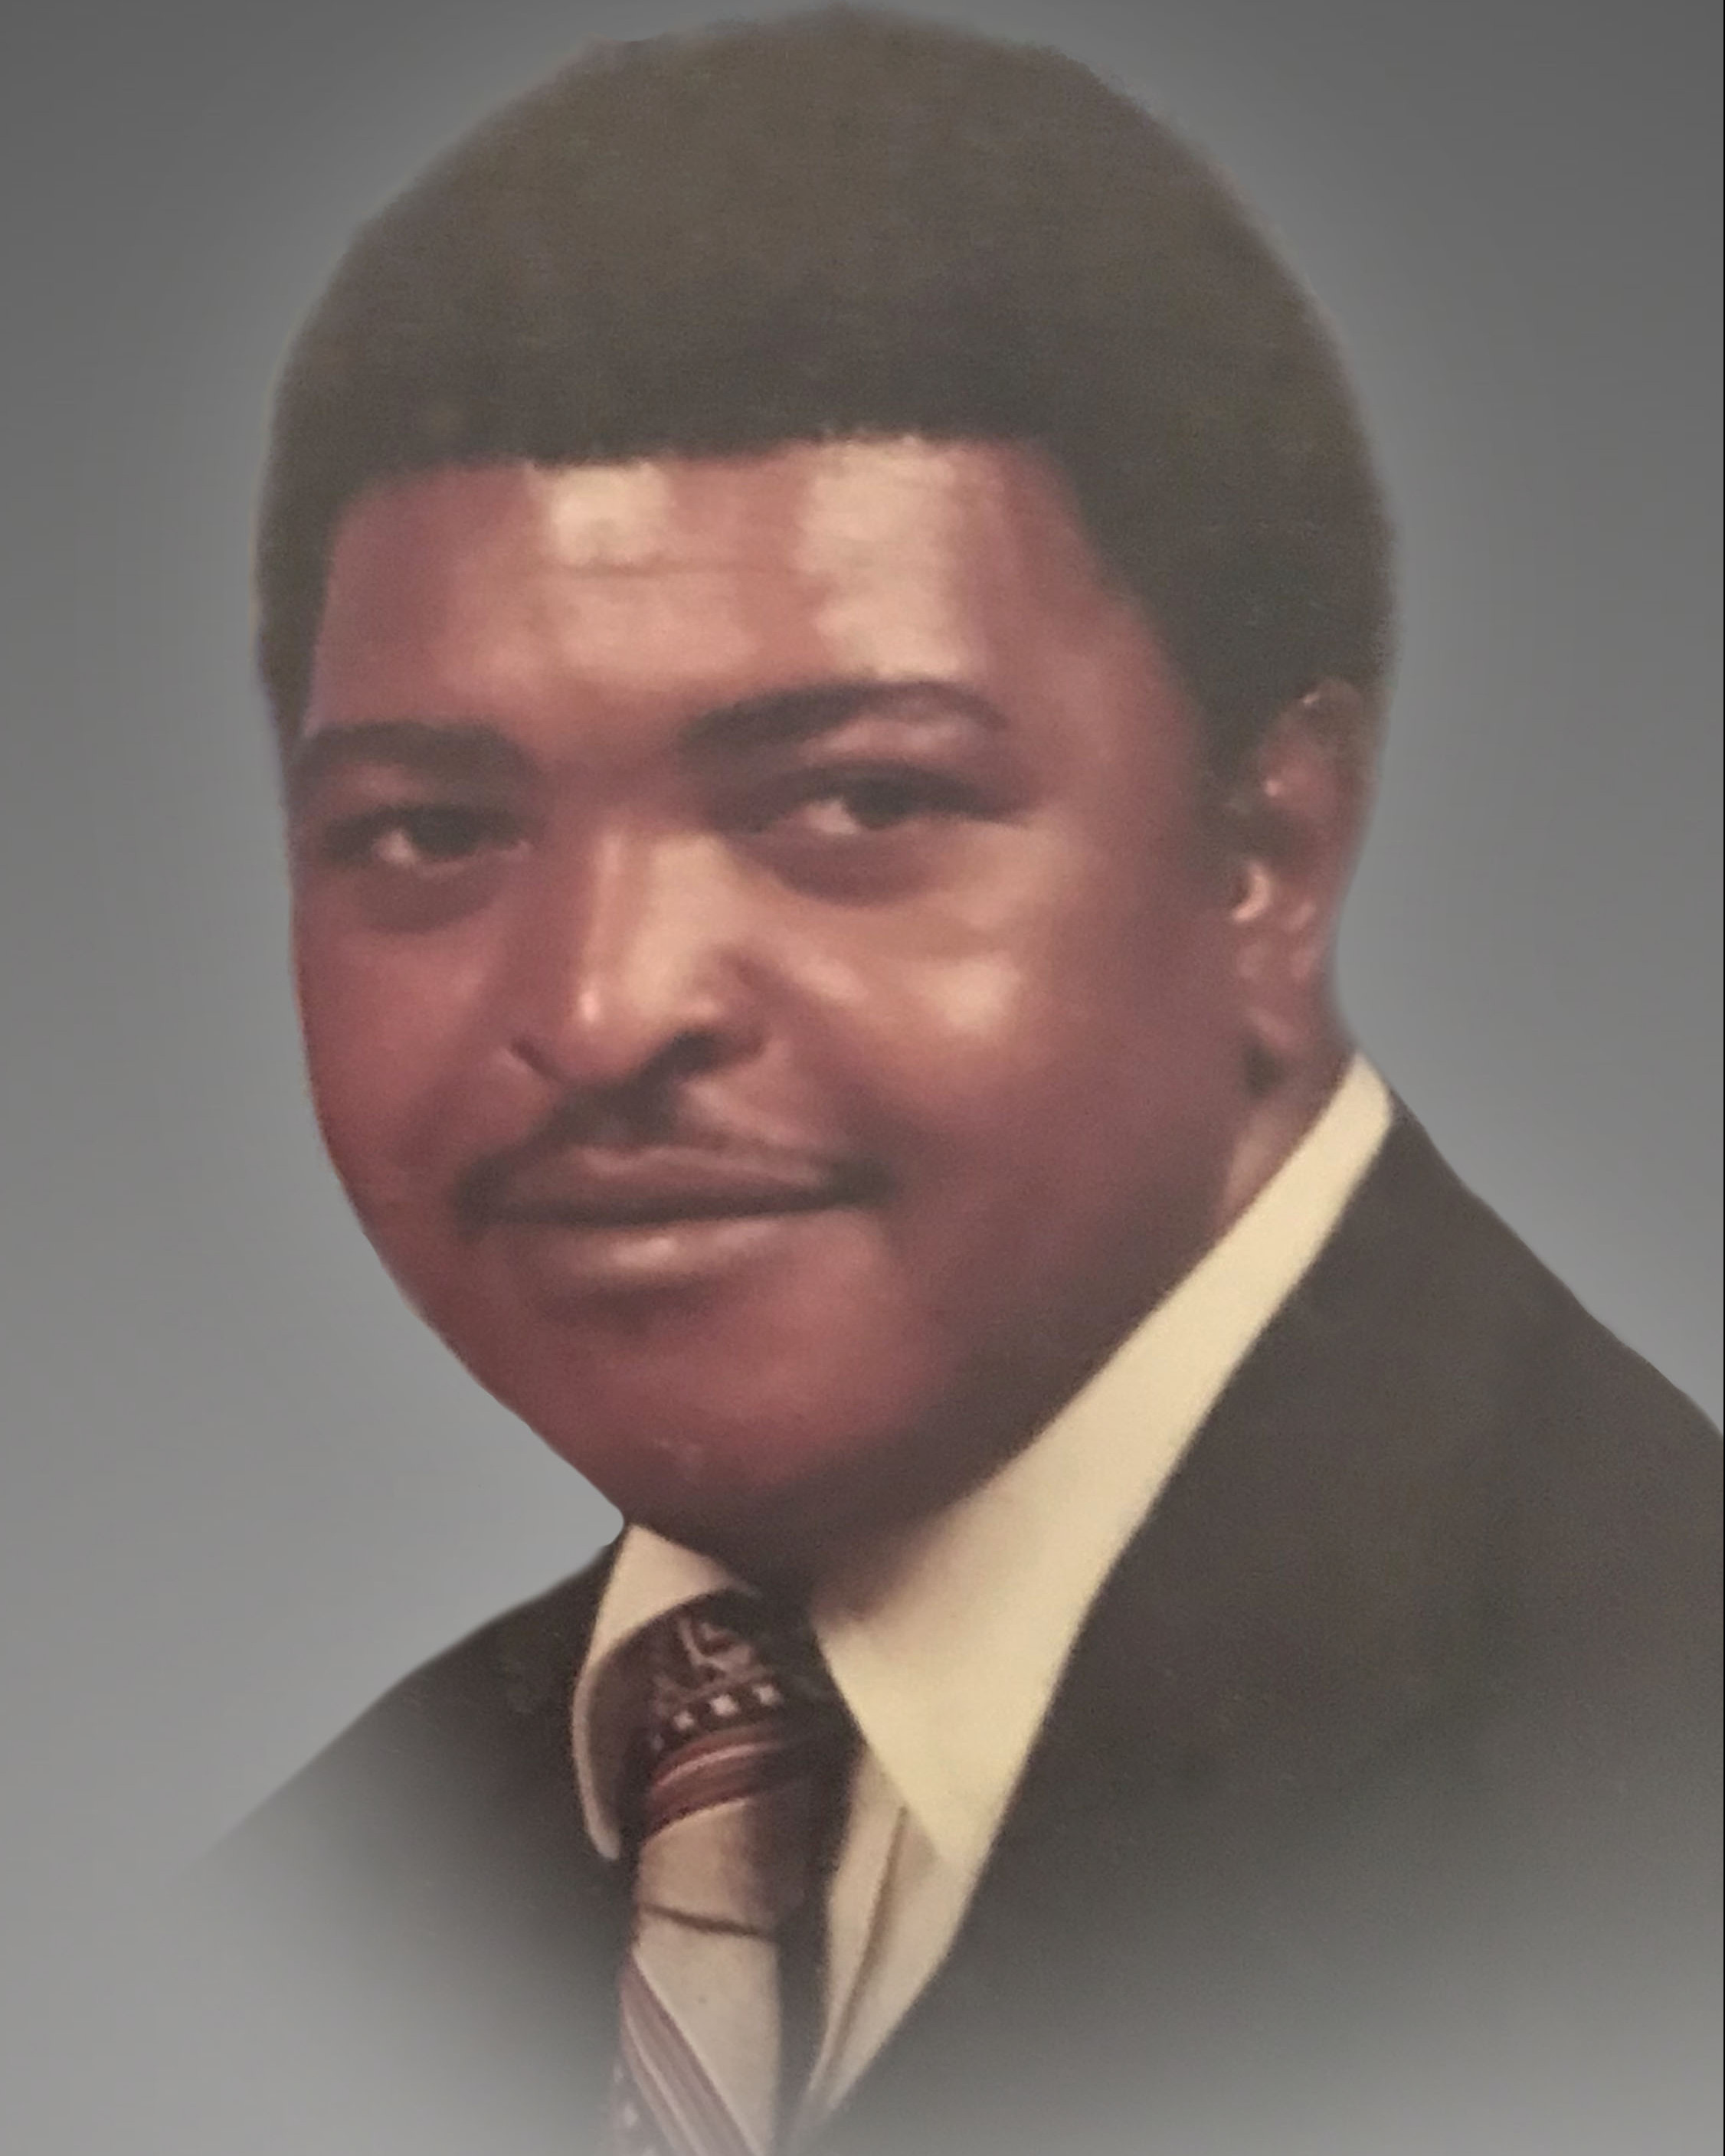 Officer Roy O'Neal Coleman | Butler Police Department, Alabama